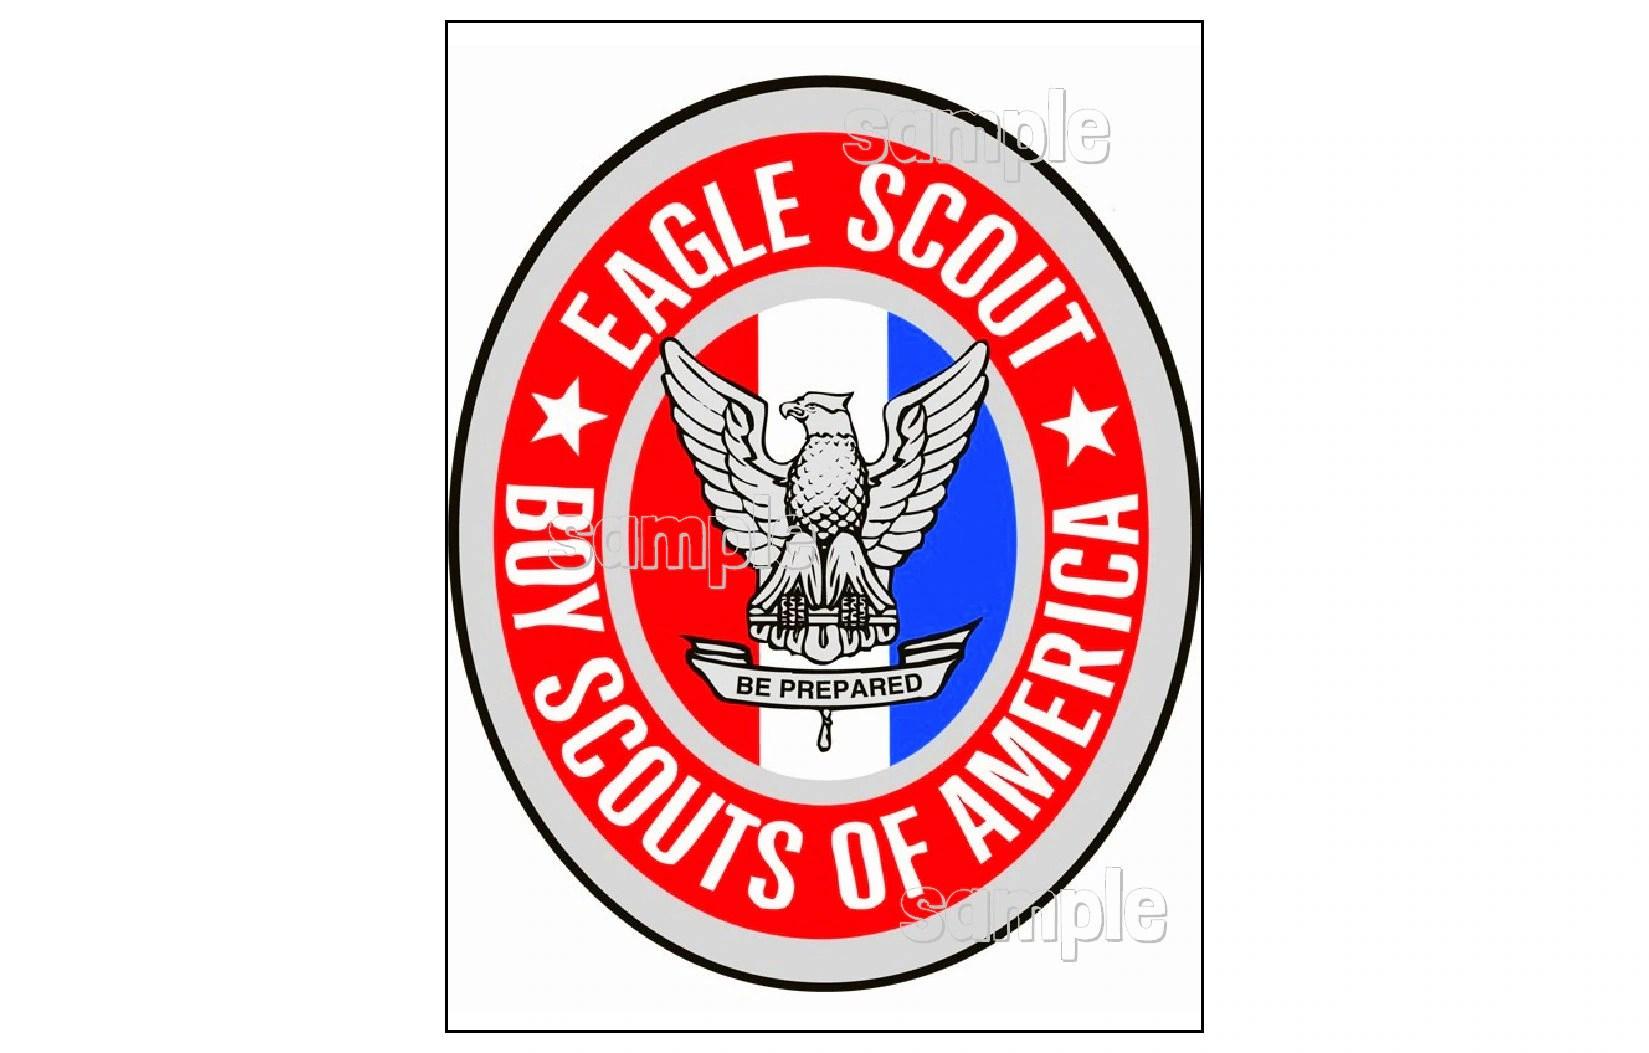 Eagle Scout Emblem Edible Image Cake Topper Decoration Sugar